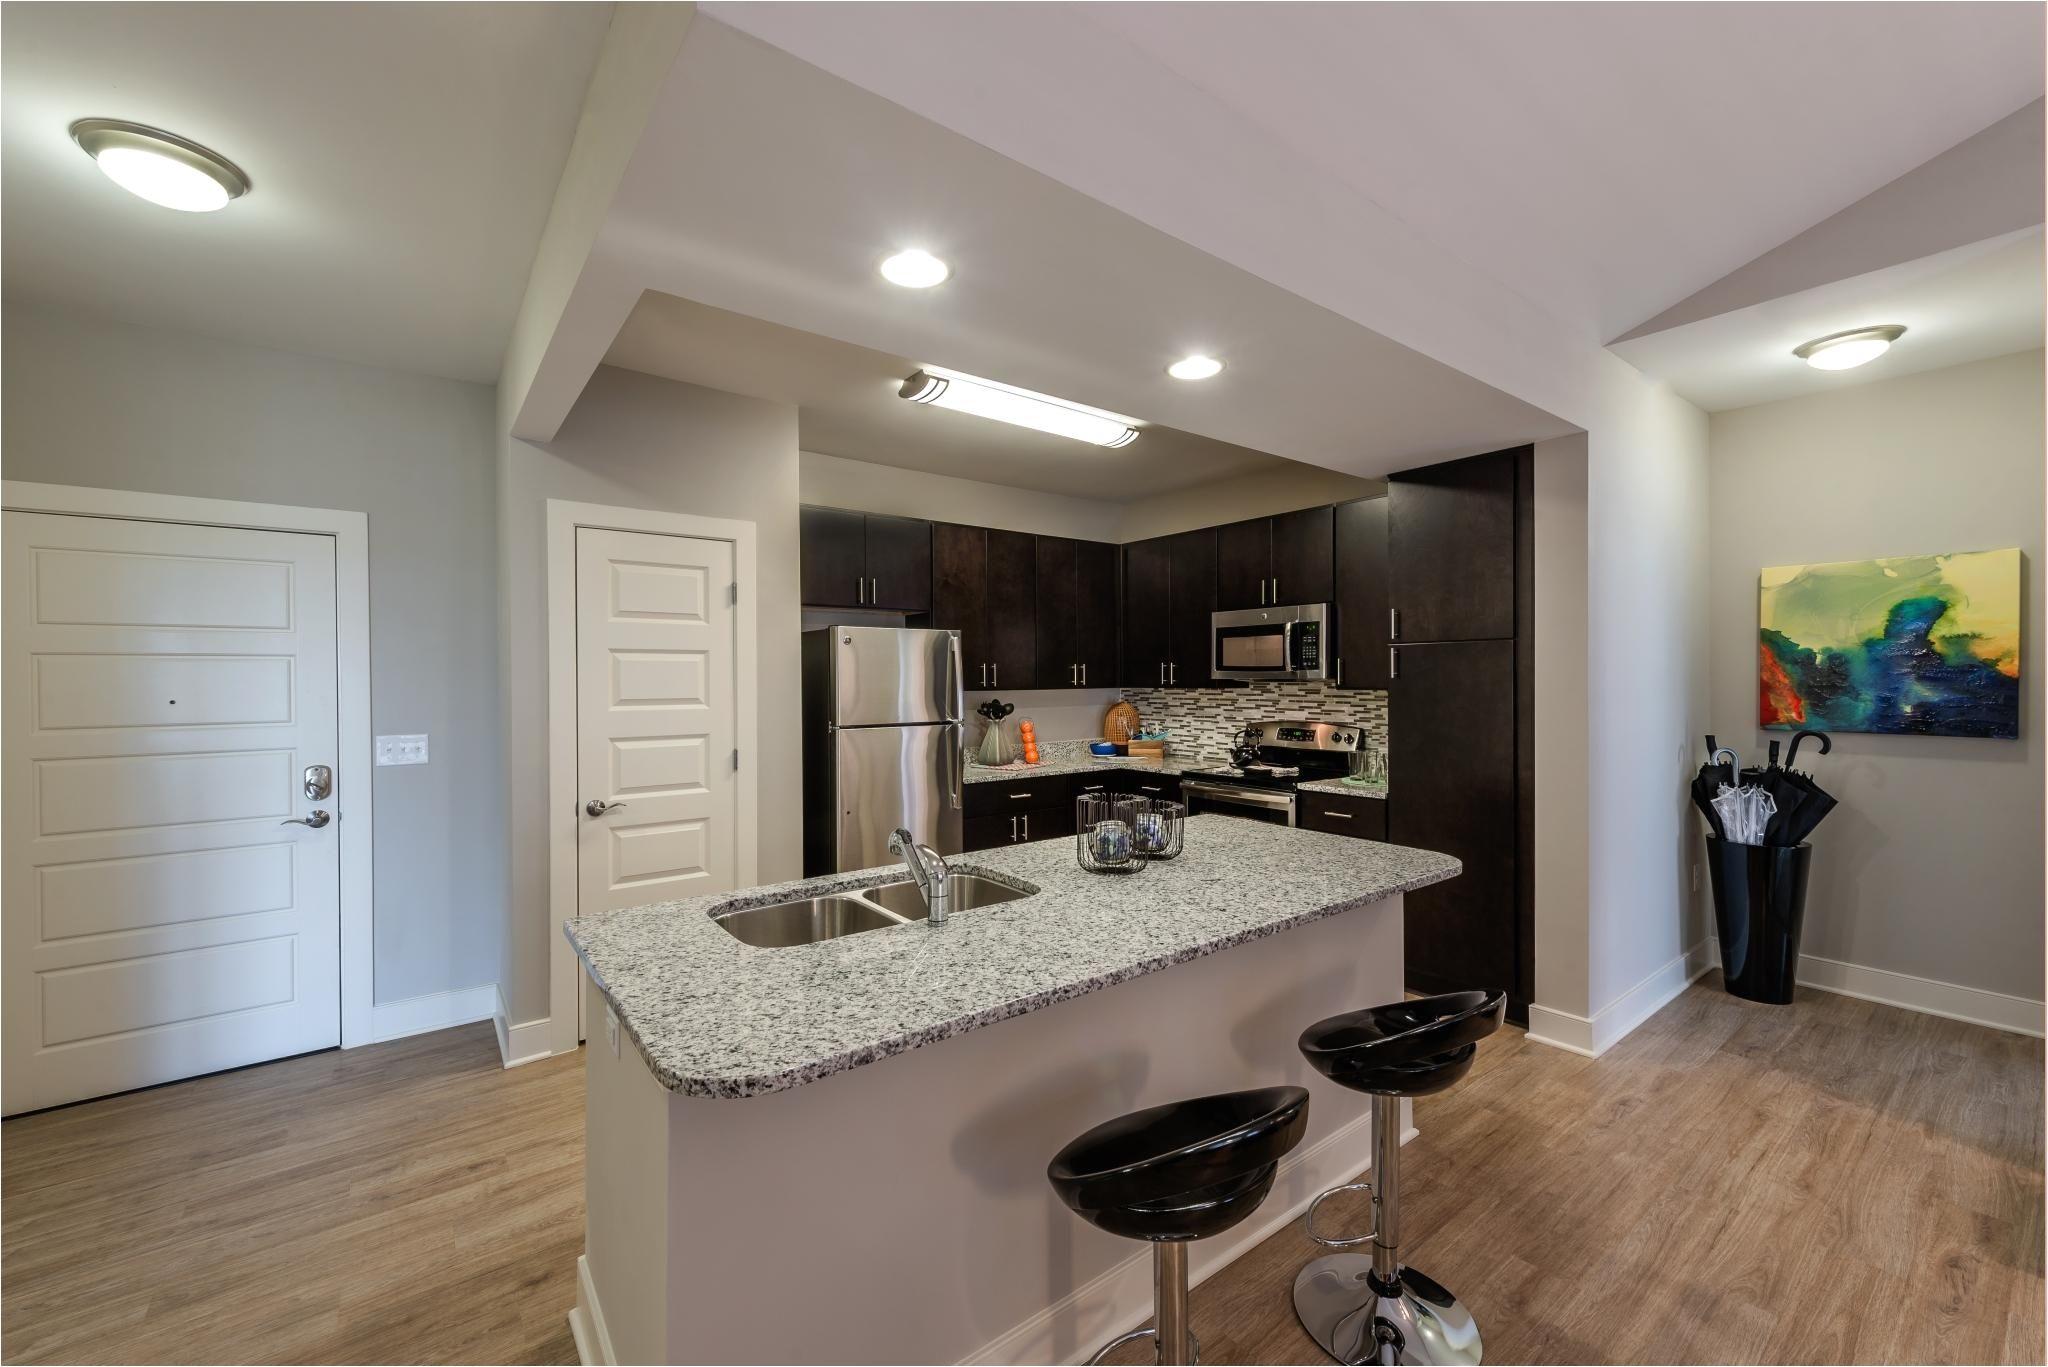 1 Bedroom Apartment Charlotte Nc Cheap